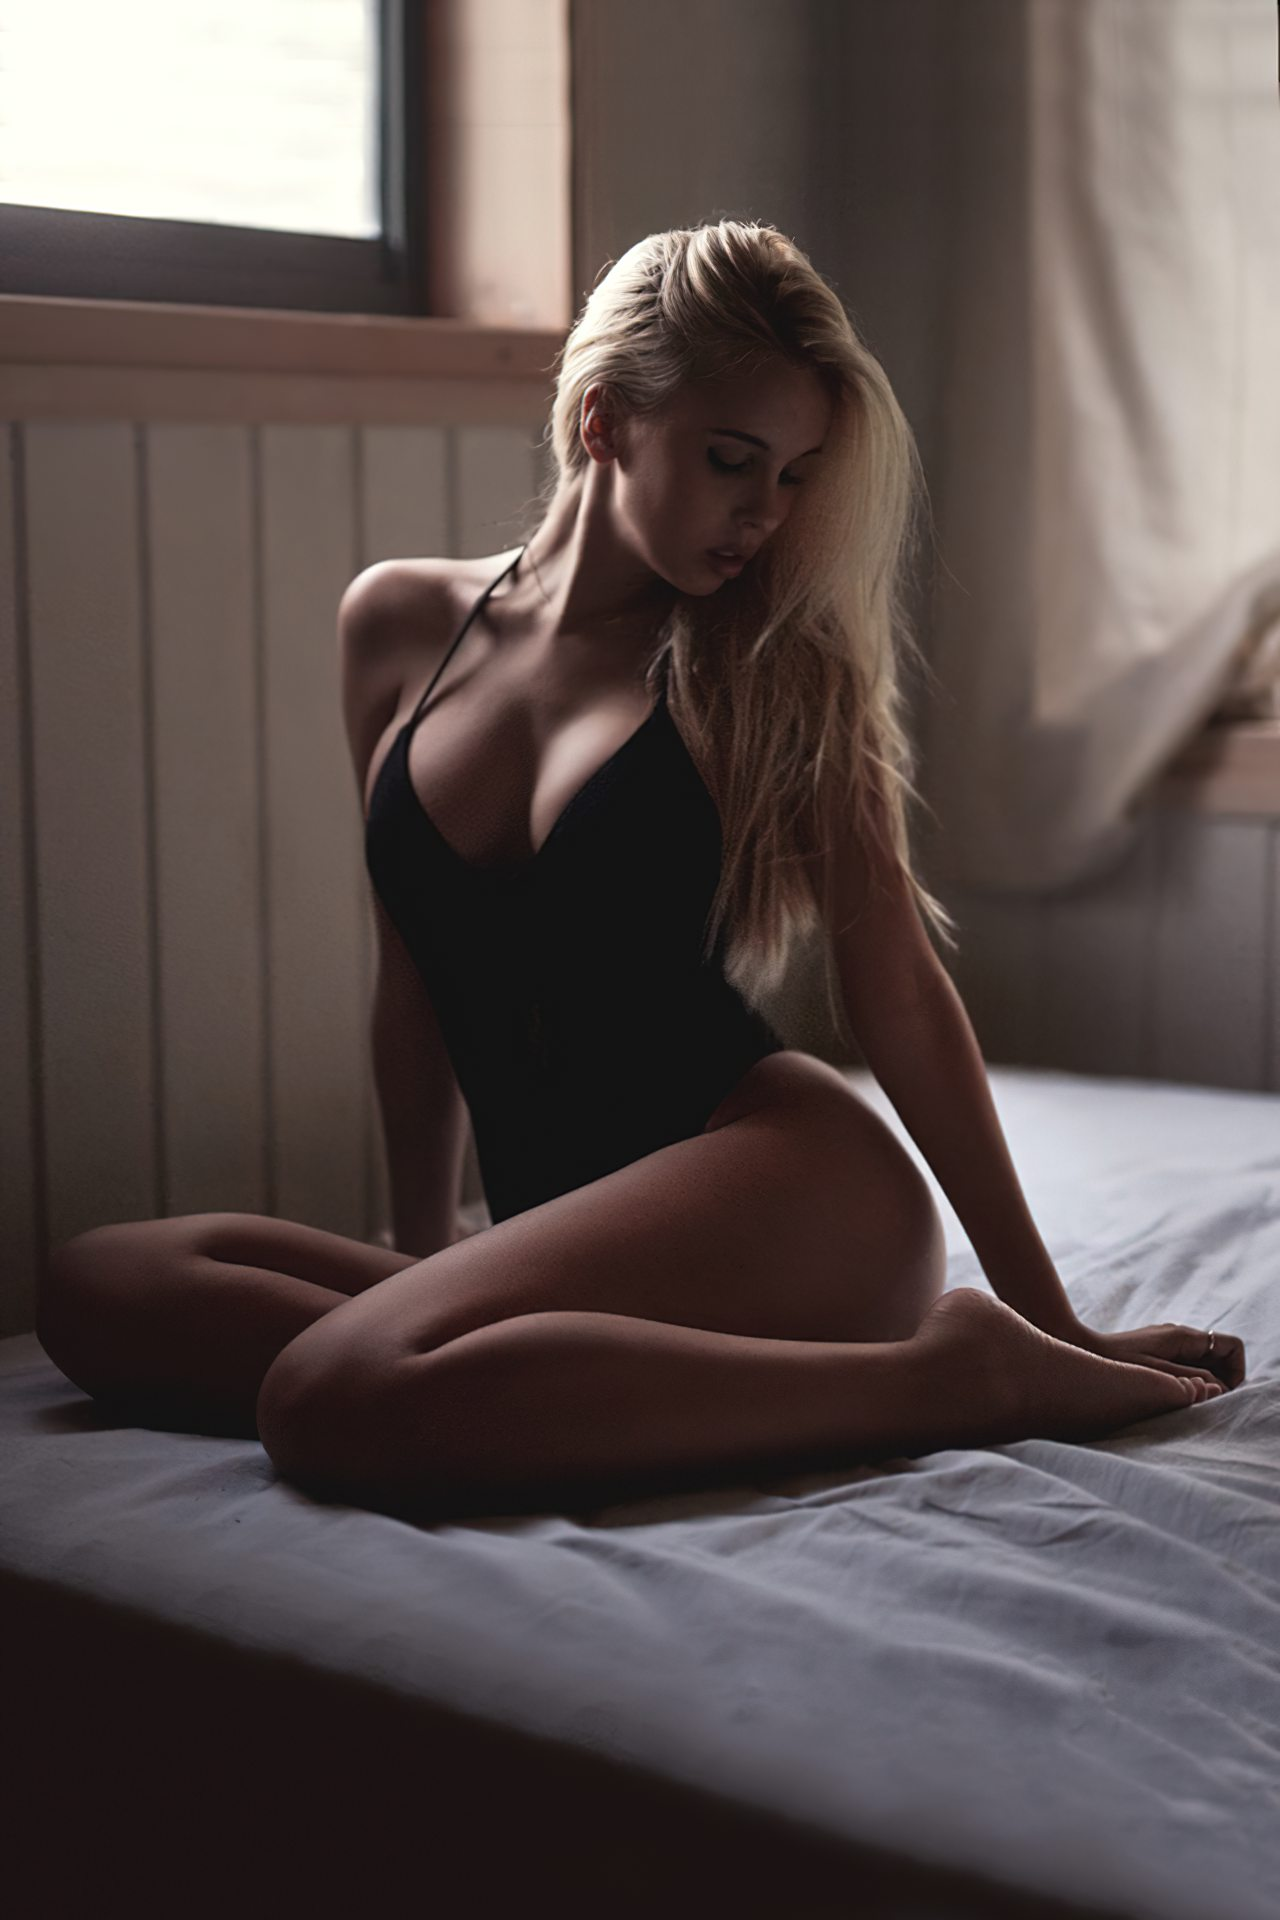 Fotos Mulheres Despidas (11)